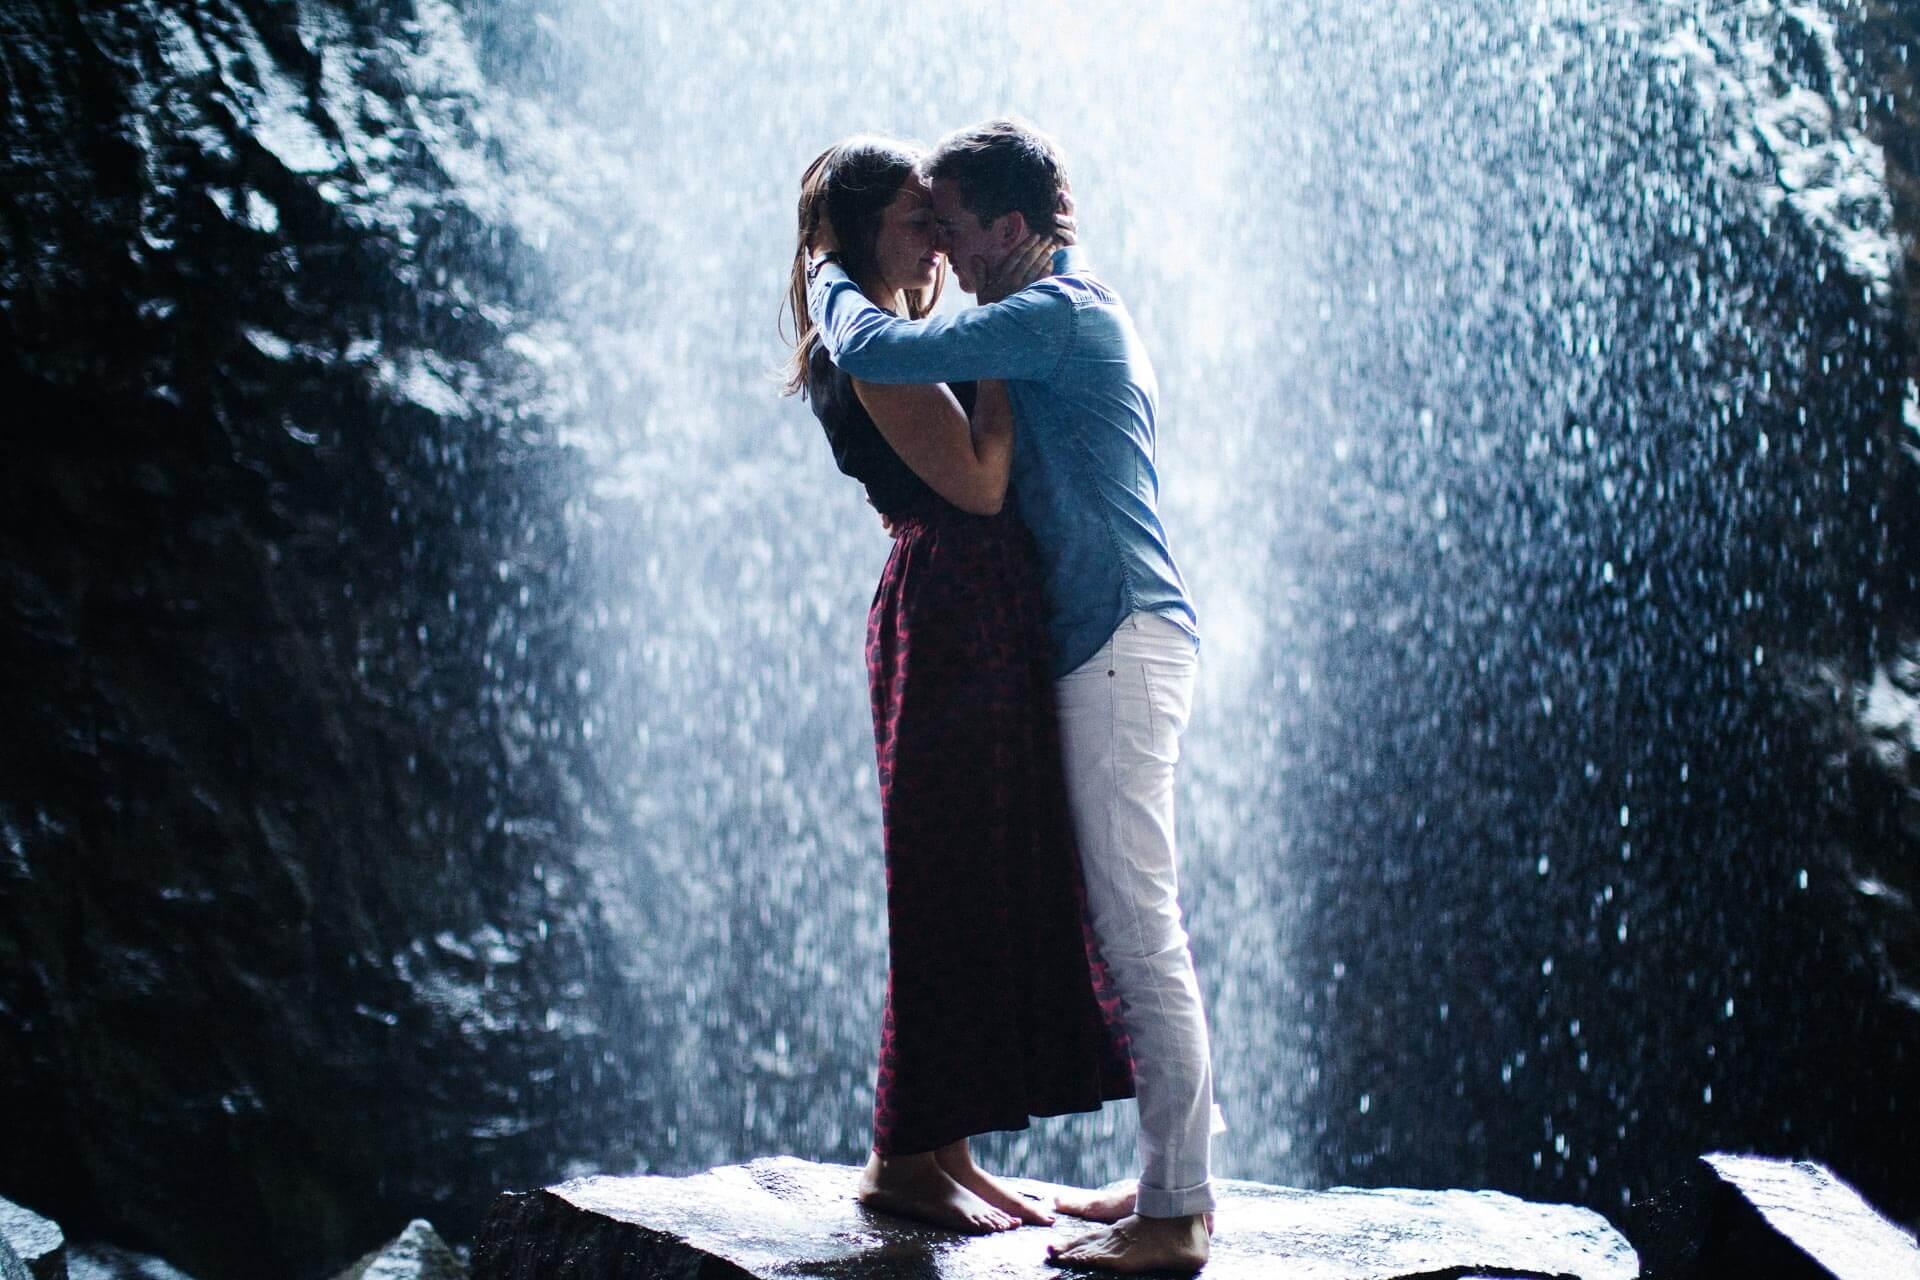 photographe-couple-nature-manon-gaetan-5